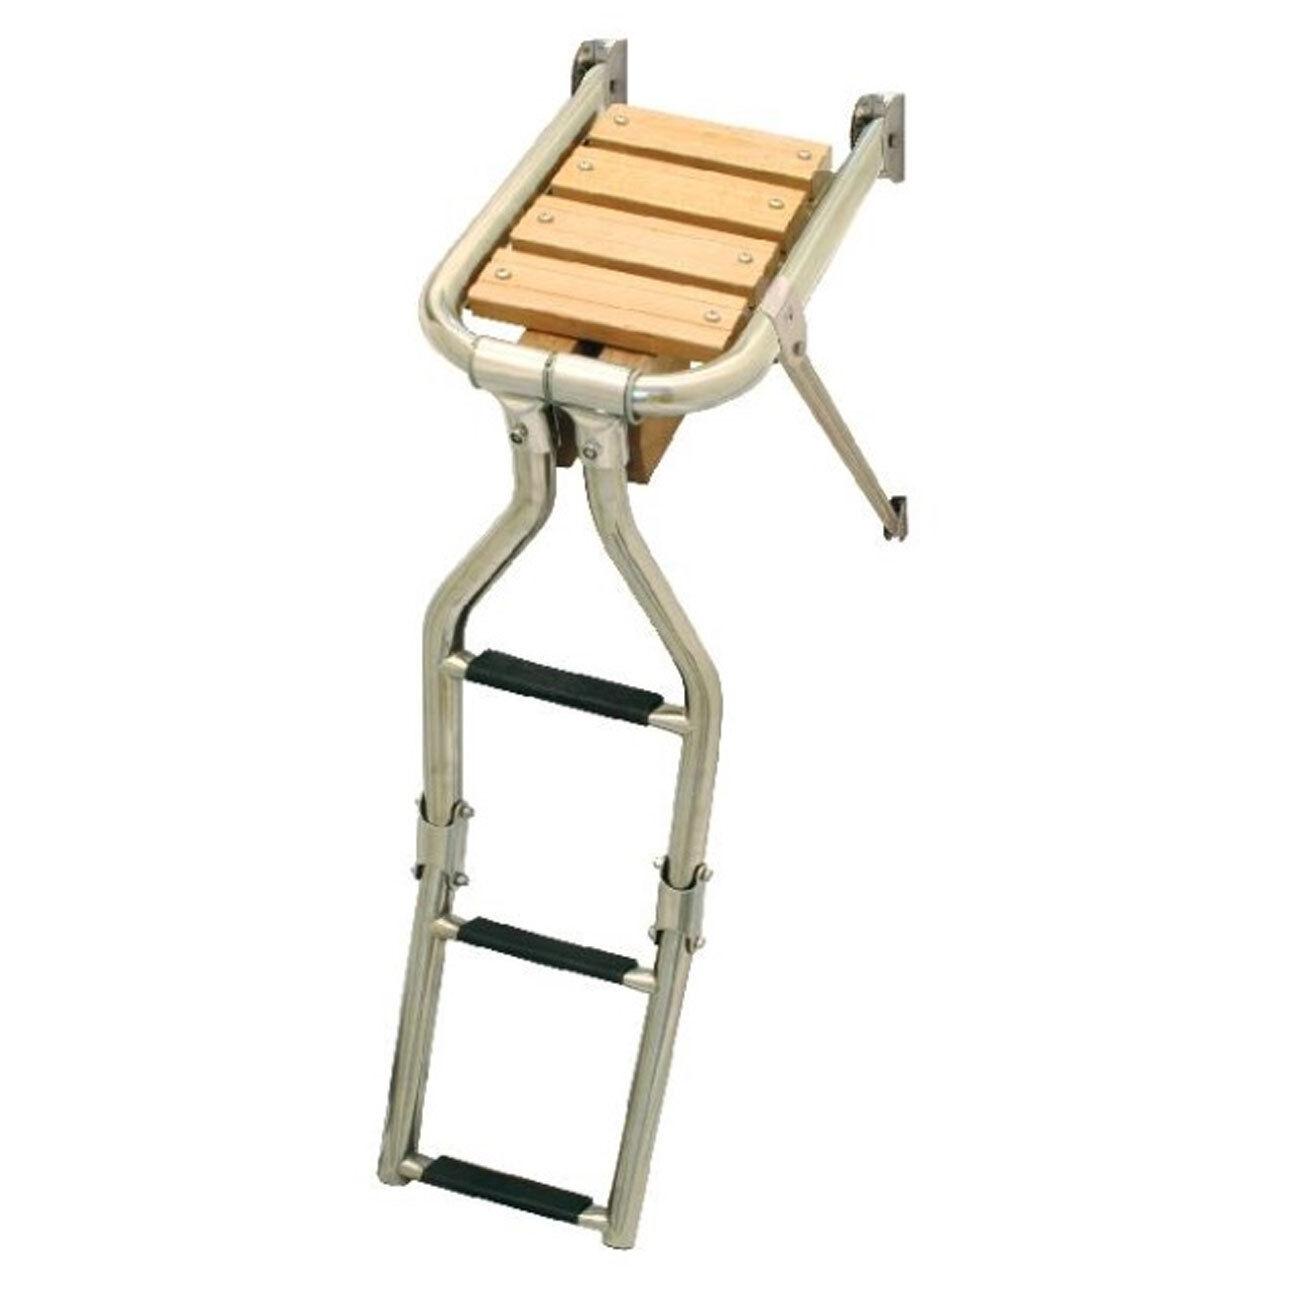 Lalizas/ Nuova Rade Stufen Teakholz Badeplattform mit Leiter klappbar 3 Stufen Rade cd8a23